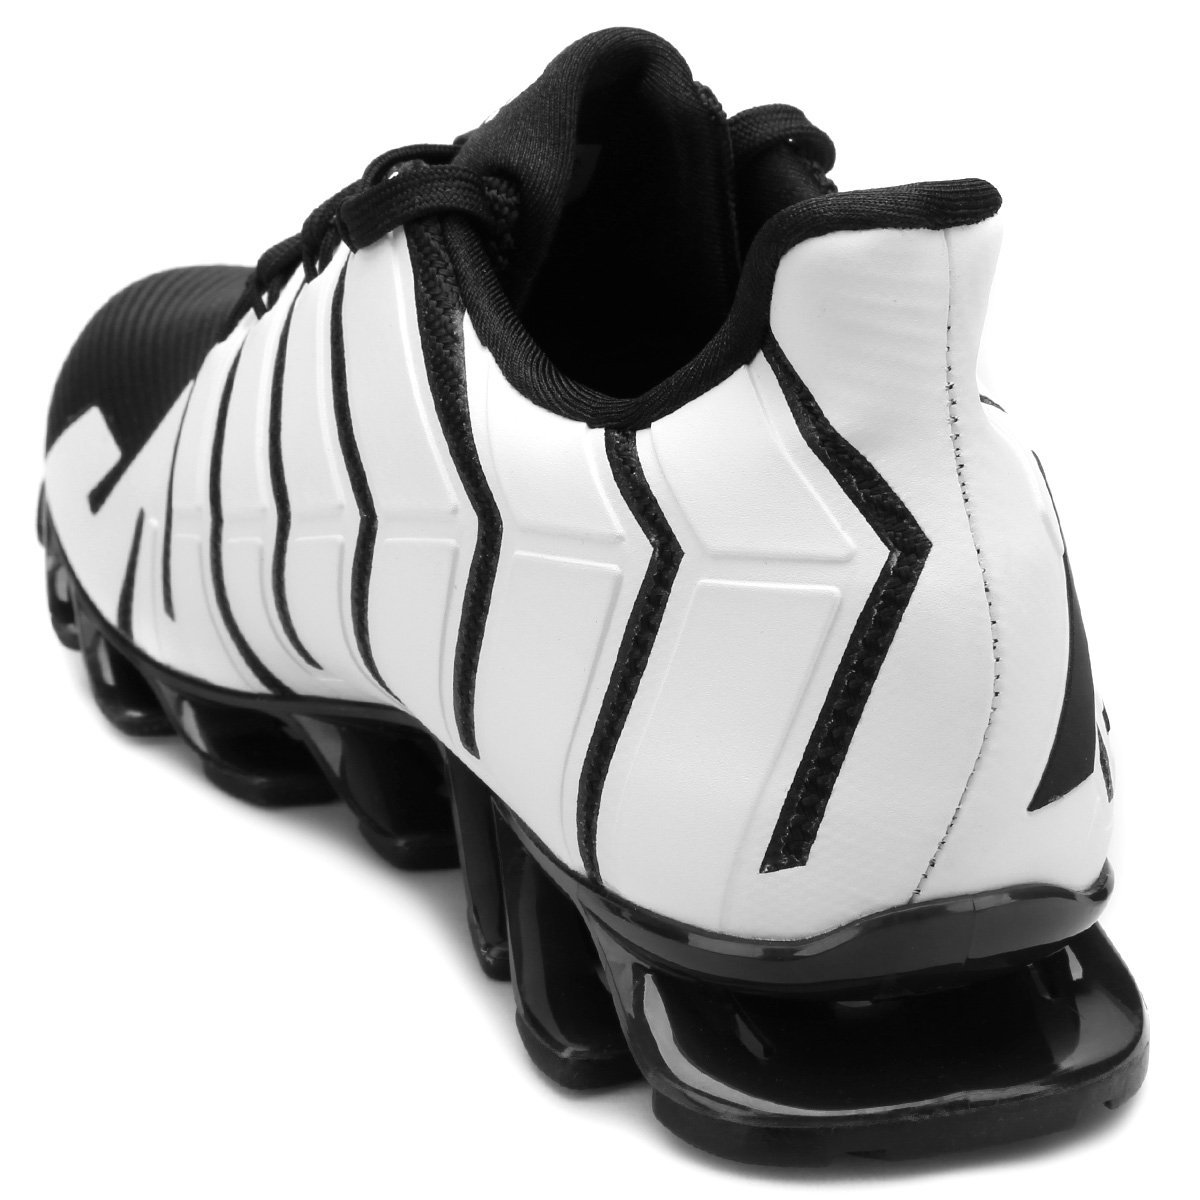 2ae905e6db Tênis Adidas Springblade Pro Masculino - Branco e Preto - Compre ...